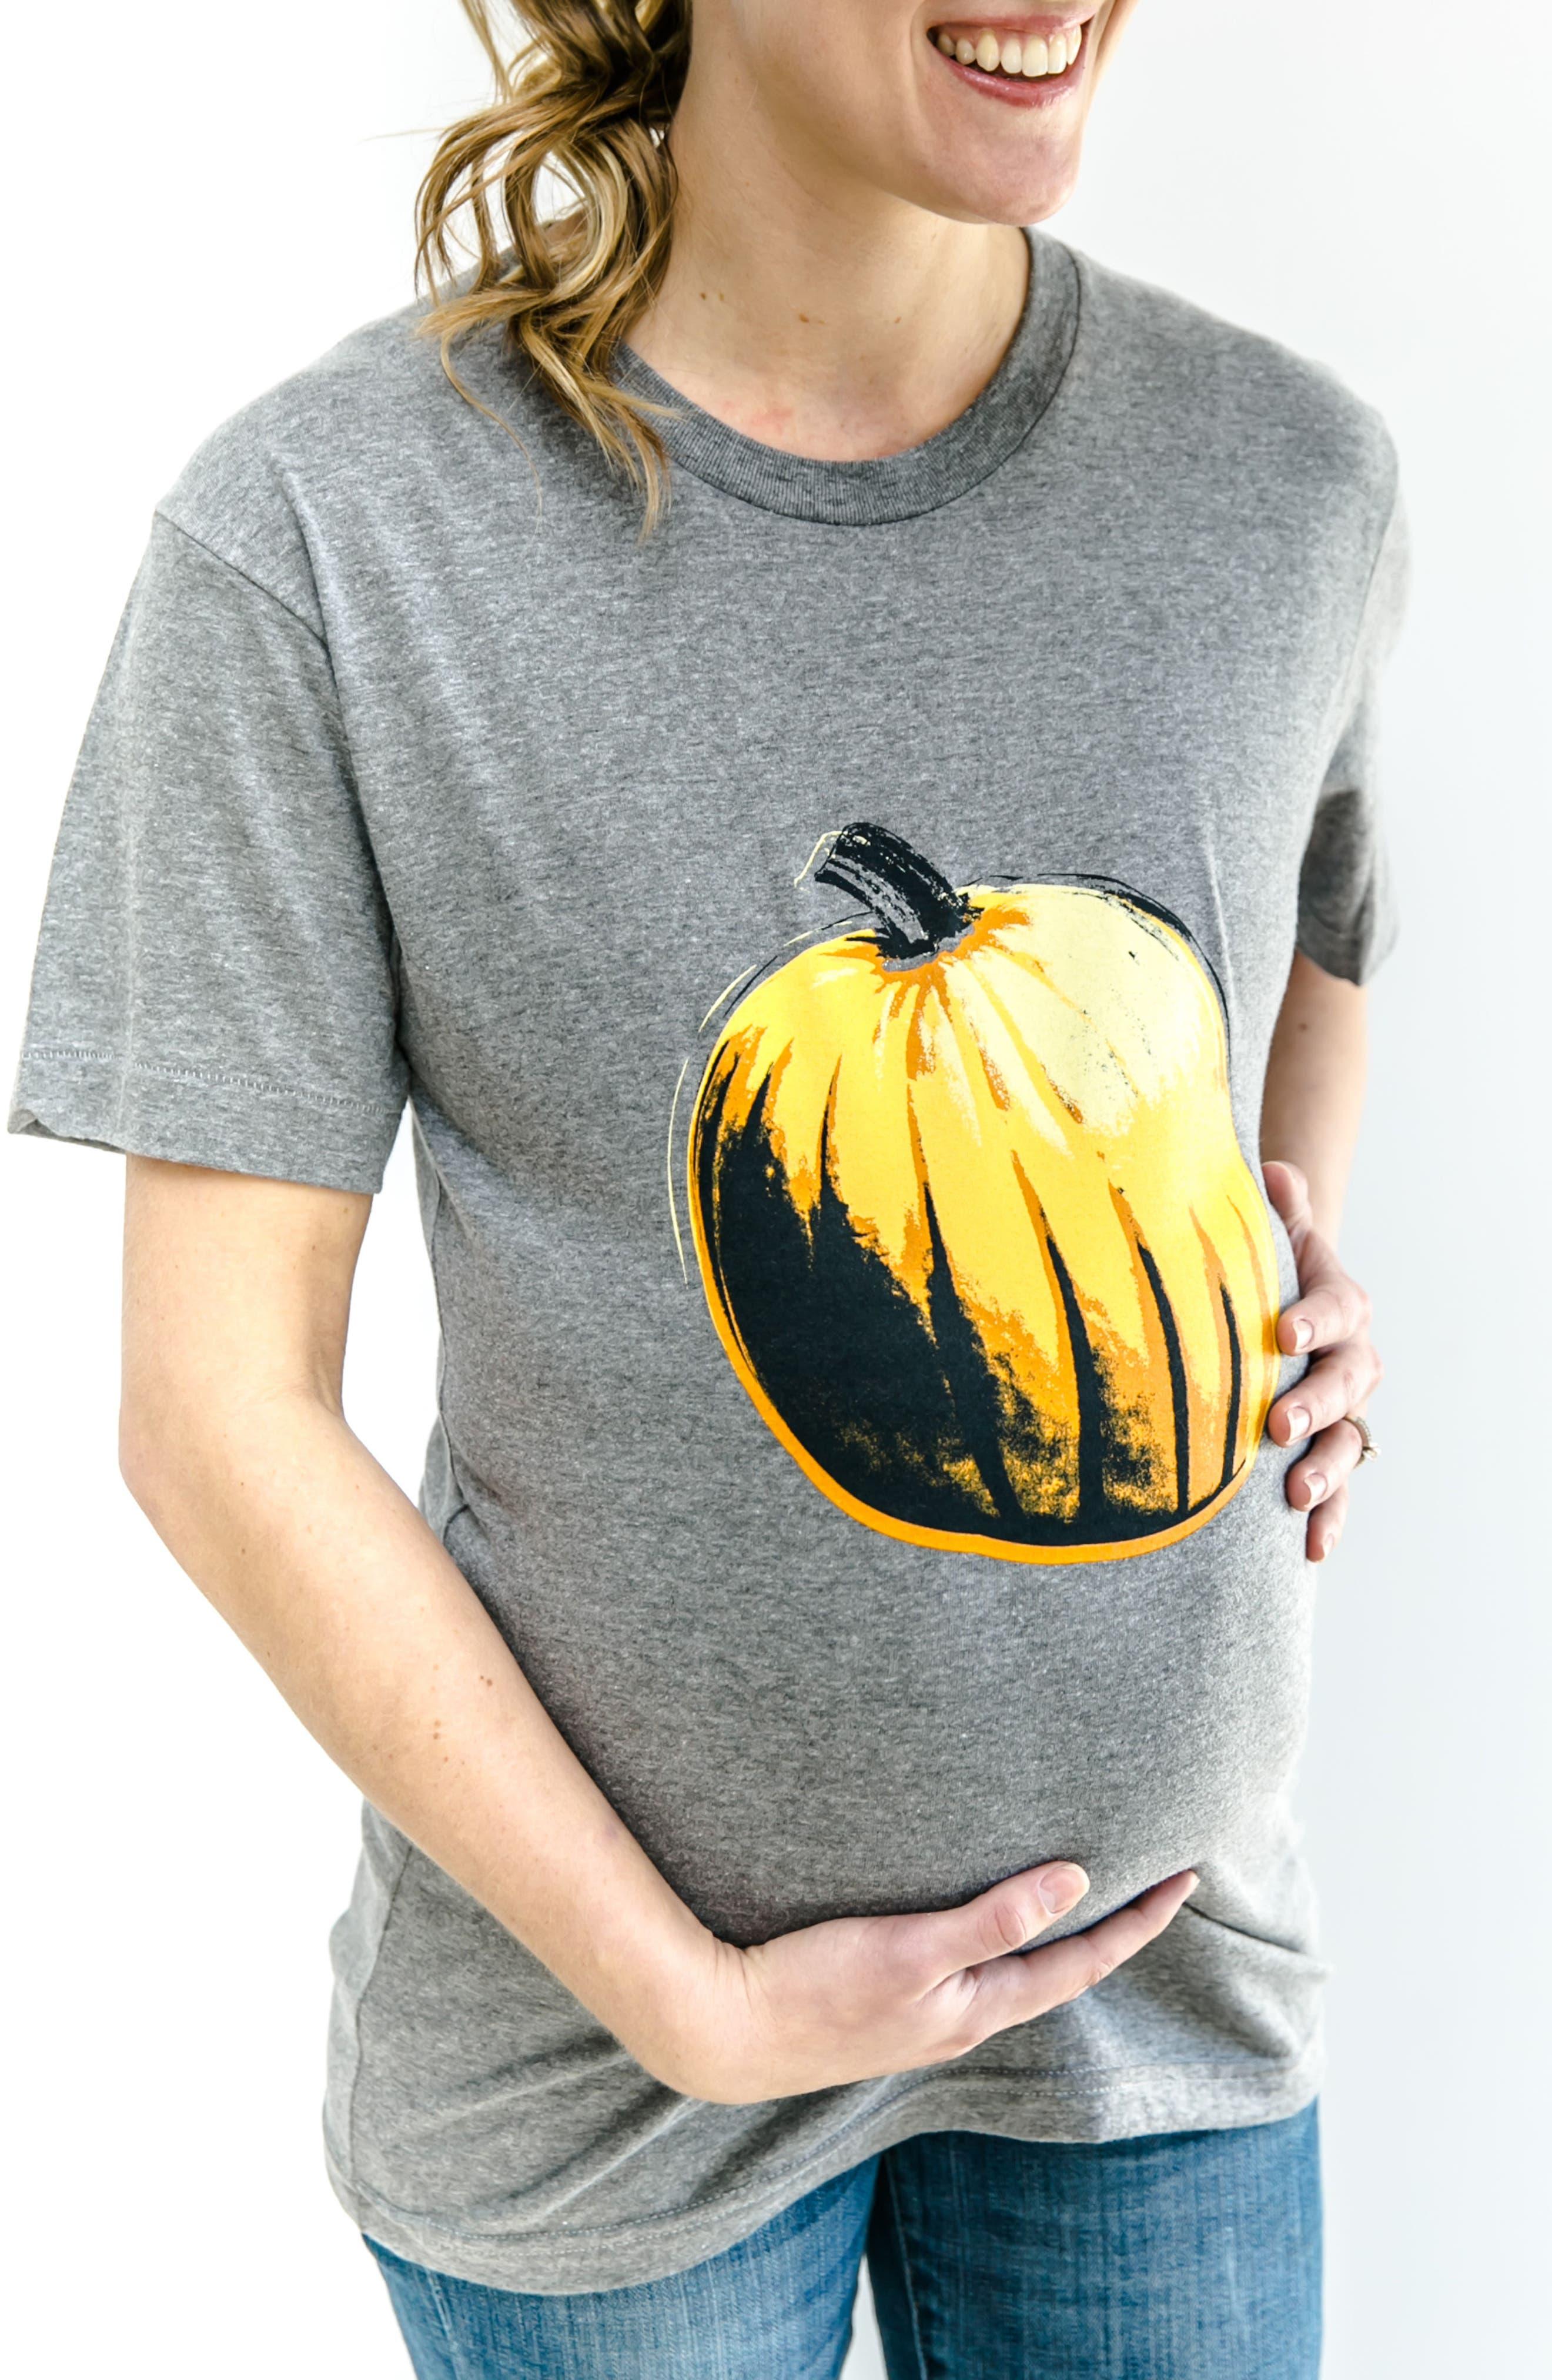 Third Trimester Pumpkin Maternity Tee,                             Alternate thumbnail 2, color,                             Grey